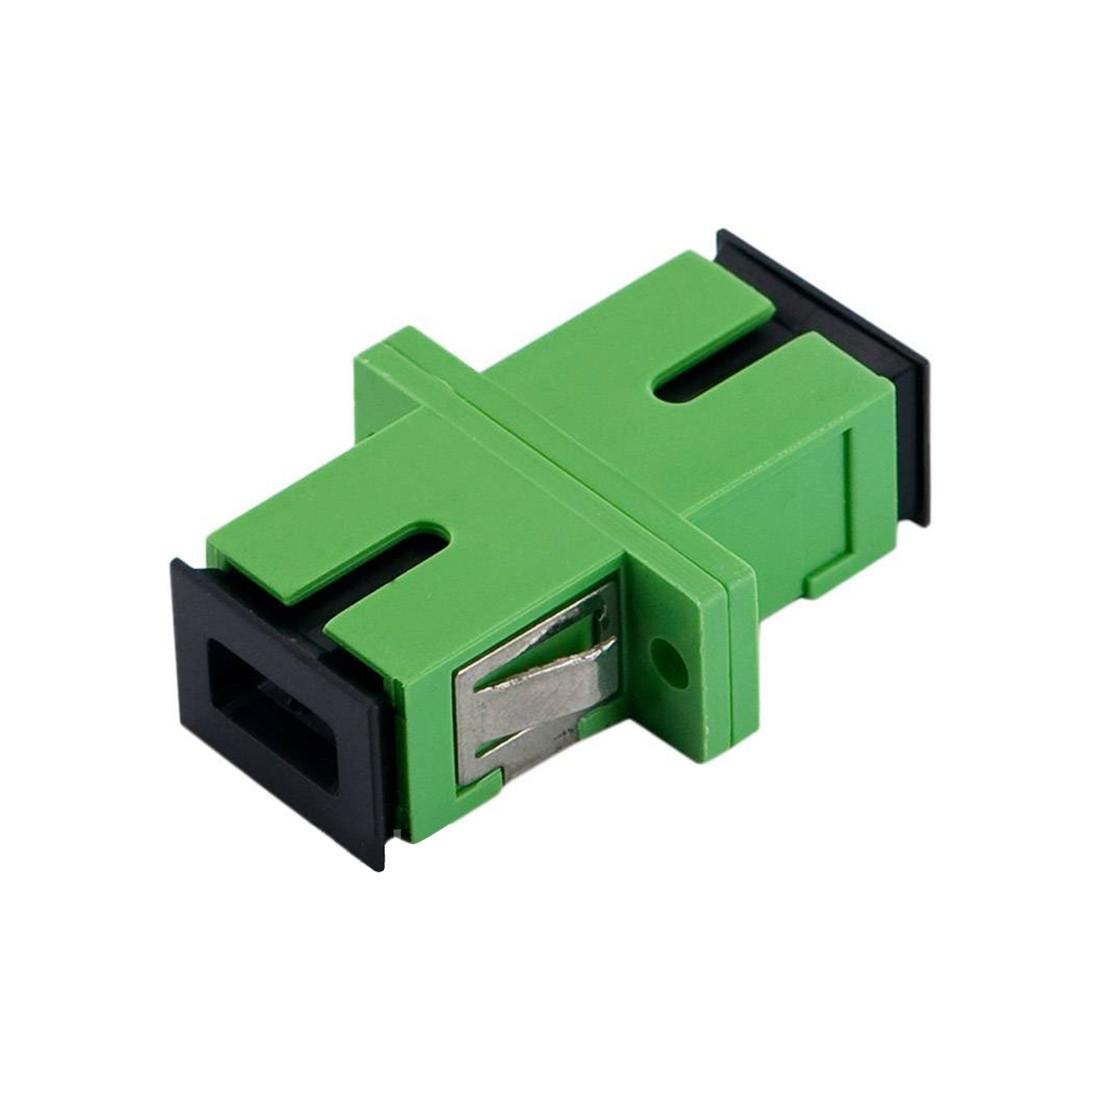 Адаптер  А-Оптик  AO-7023  LC/APC-LC/APC  SM  DSimplex